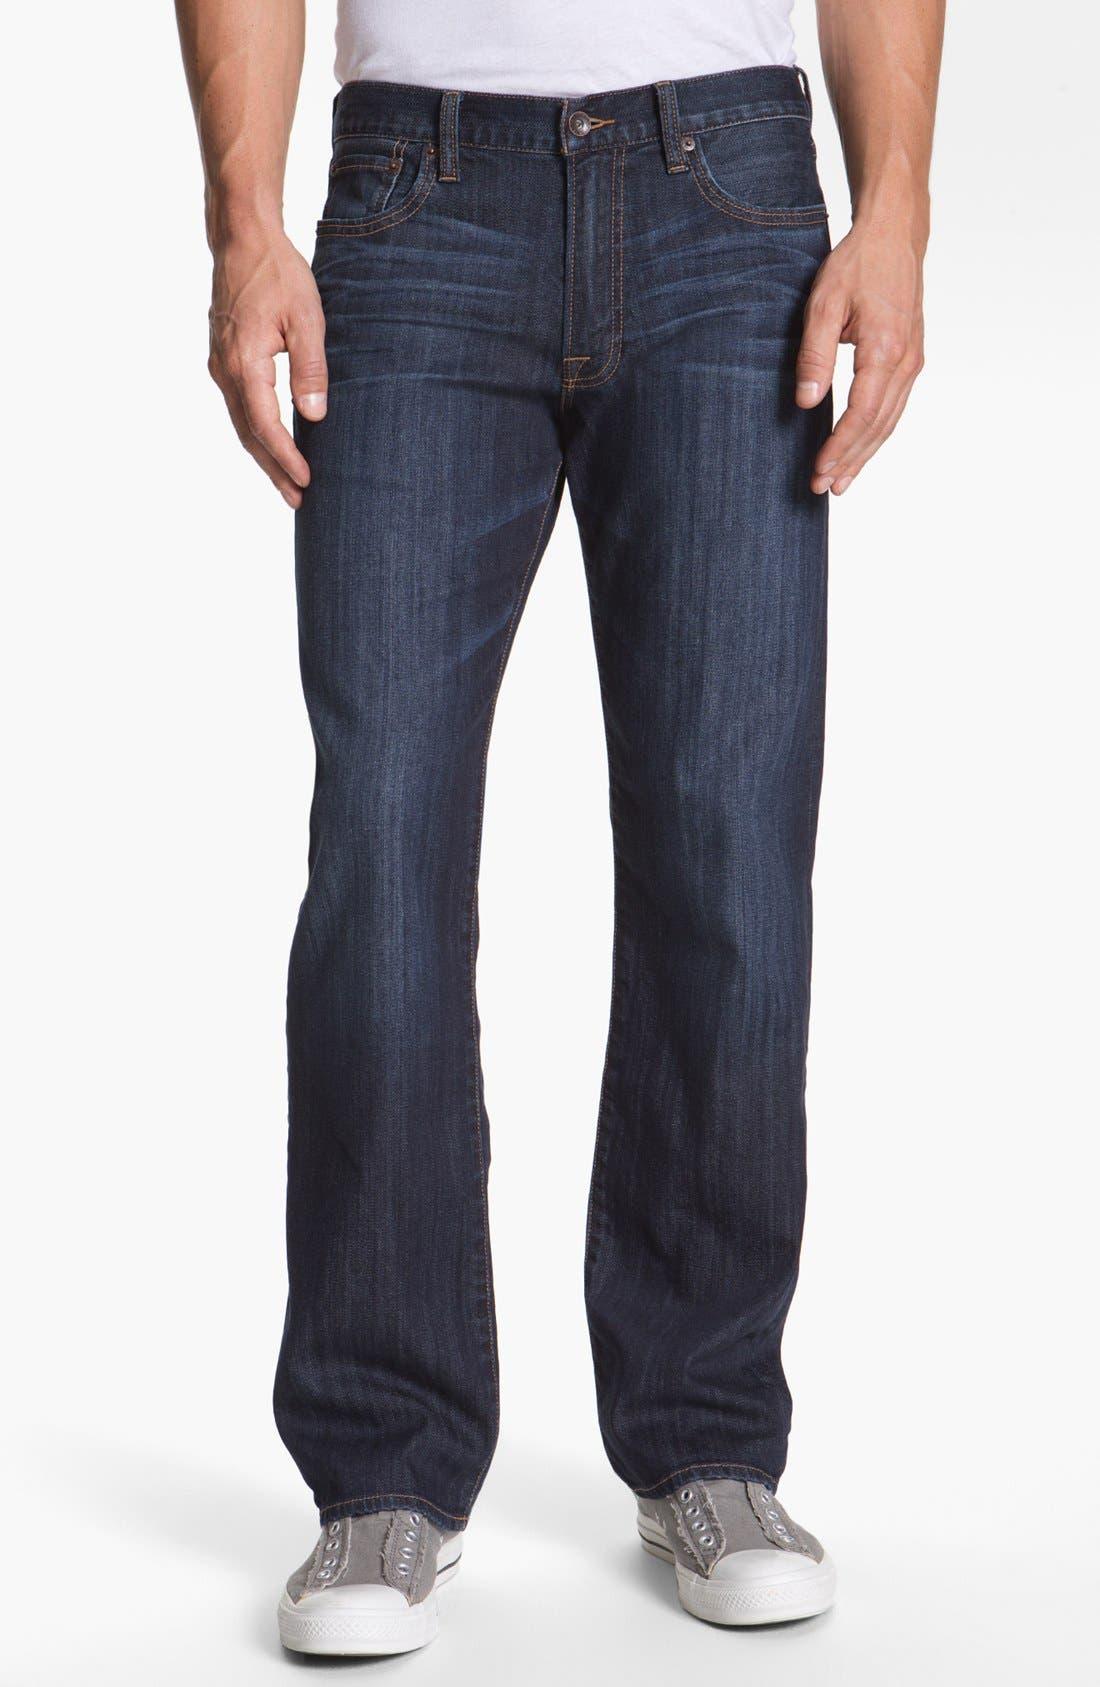 Alternate Image 1 Selected - Lucky Brand '361 Vintage' Straight Leg Jeans (Chanson)